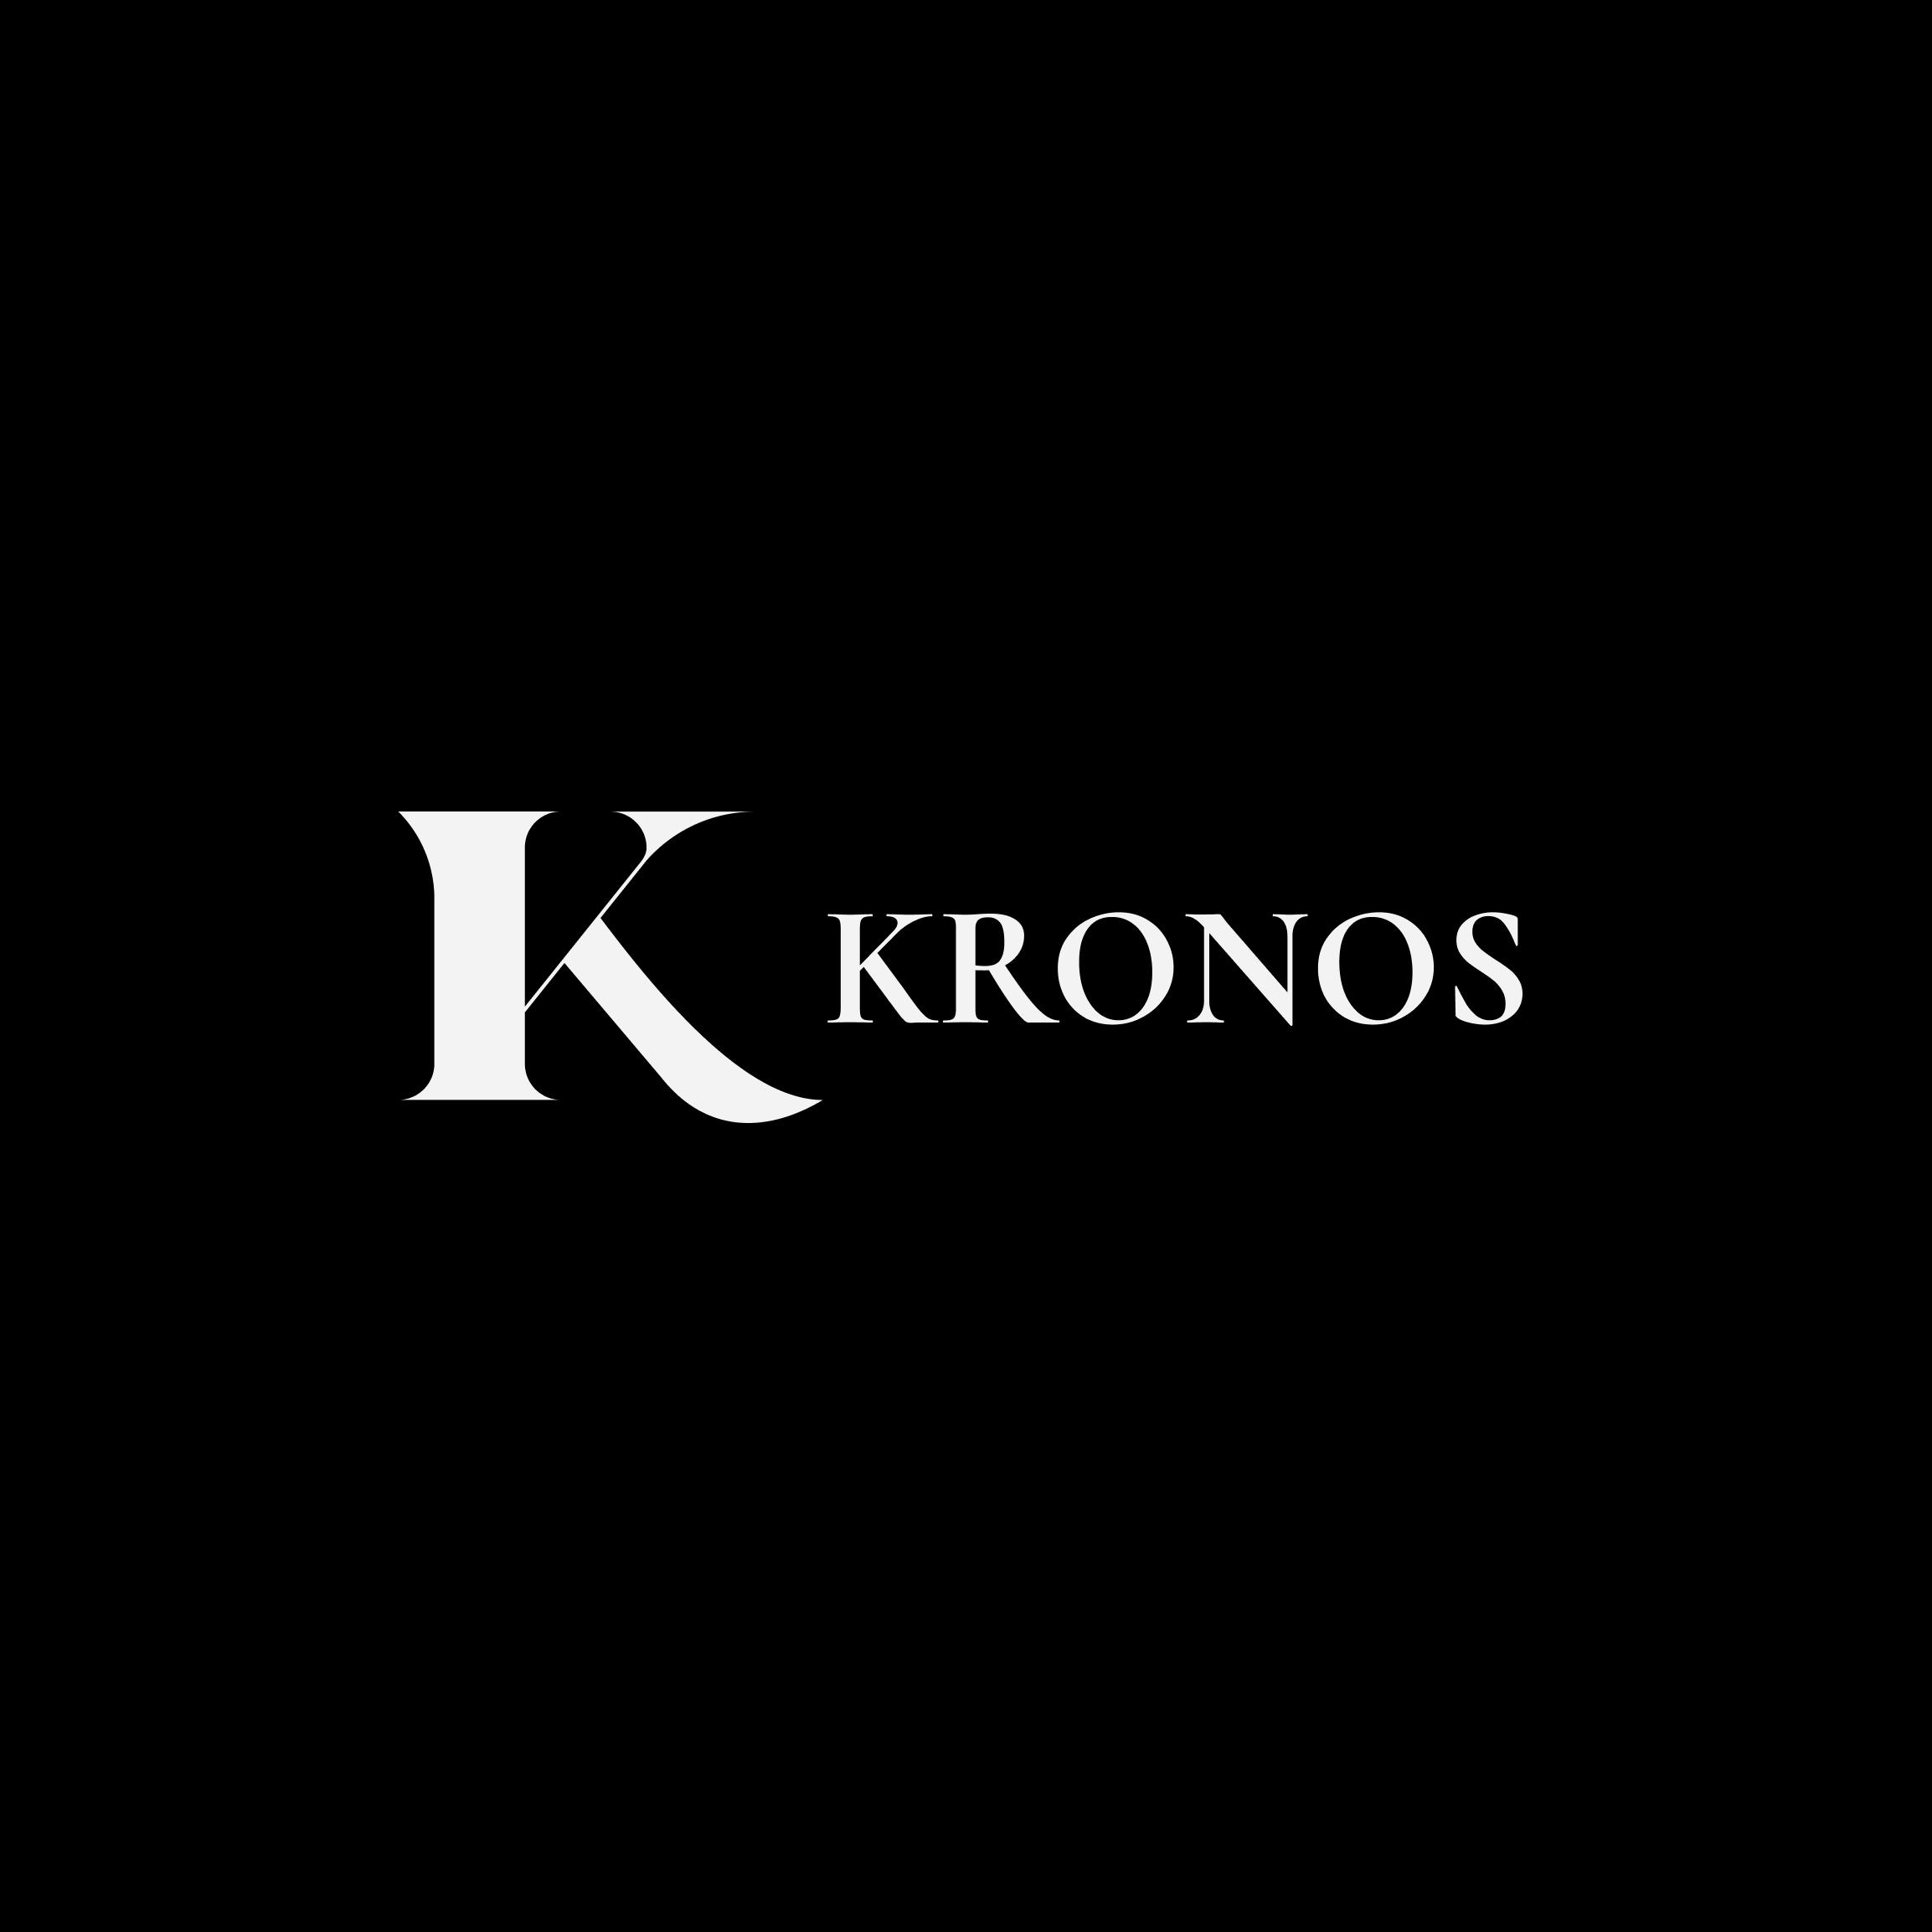 Разработать логотип KRONOS фото f_6695faf150d1b221.png